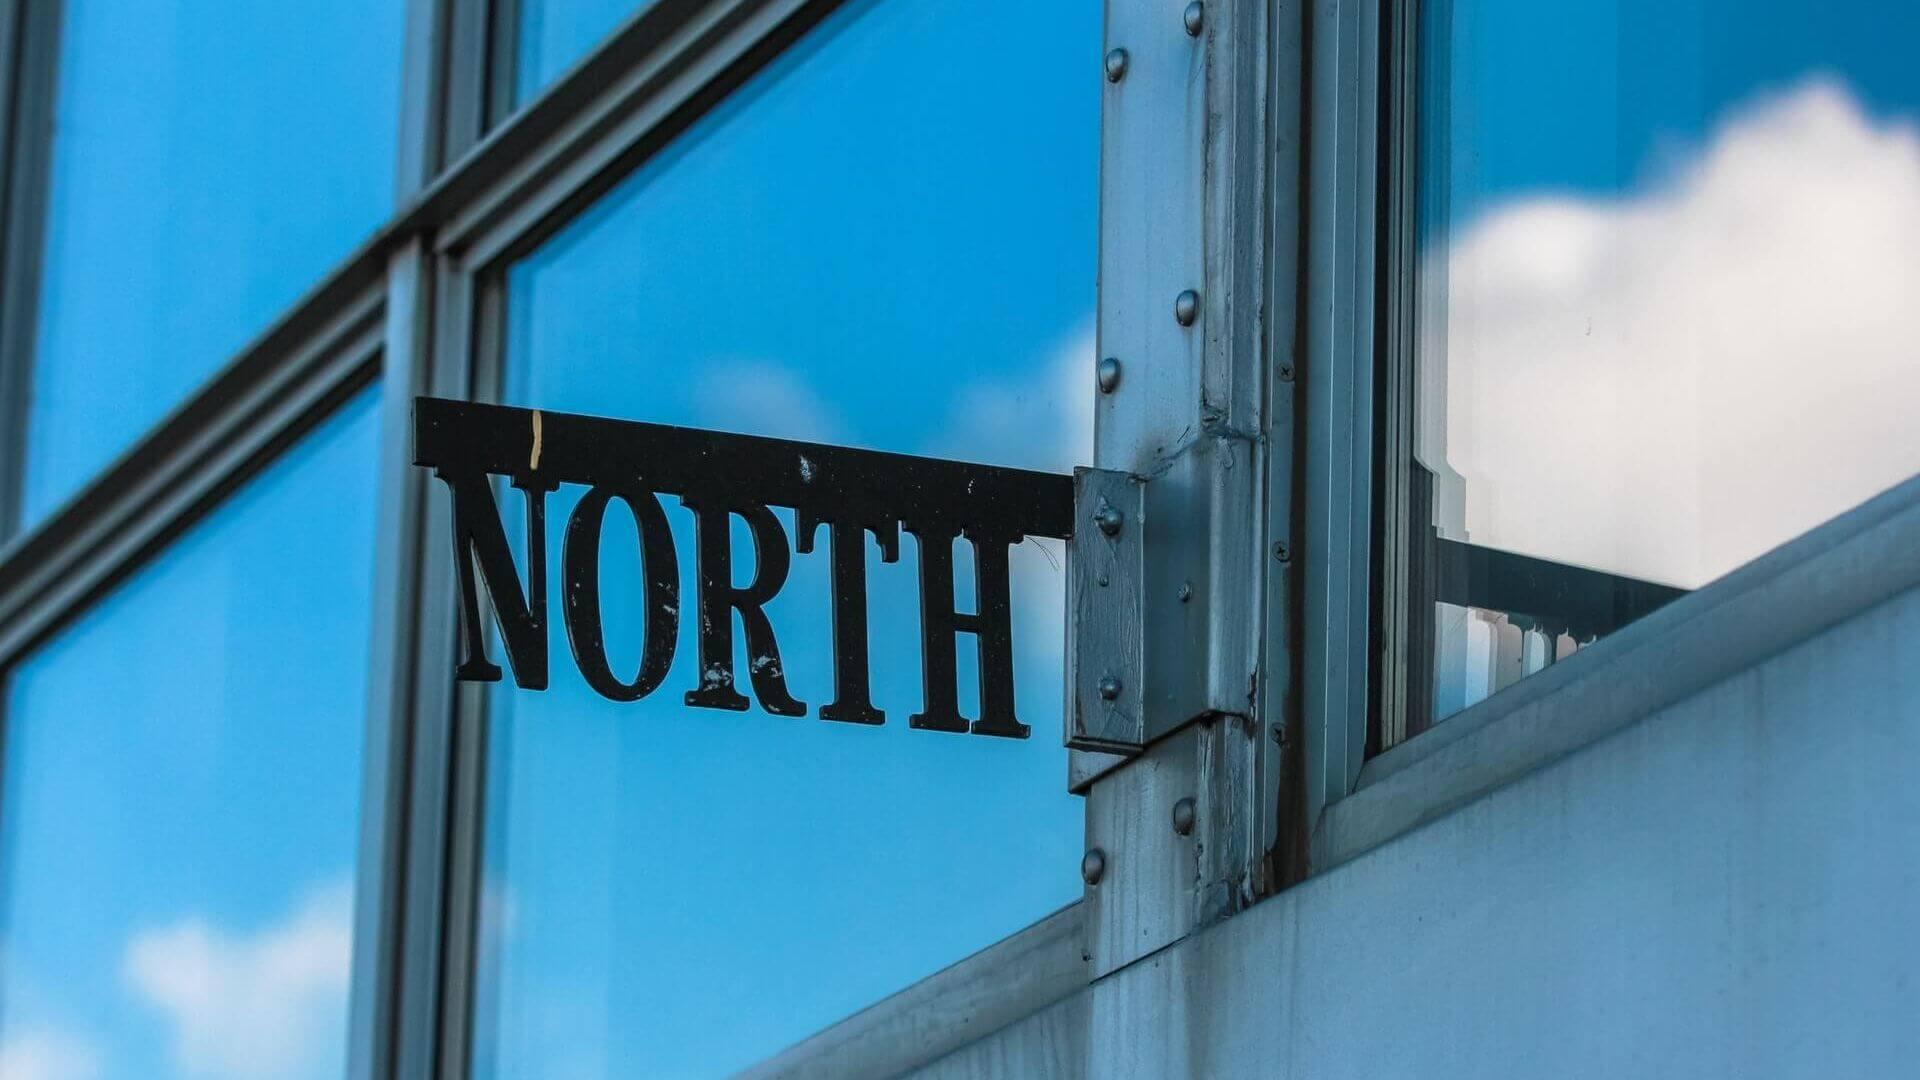 placa norte predio azul